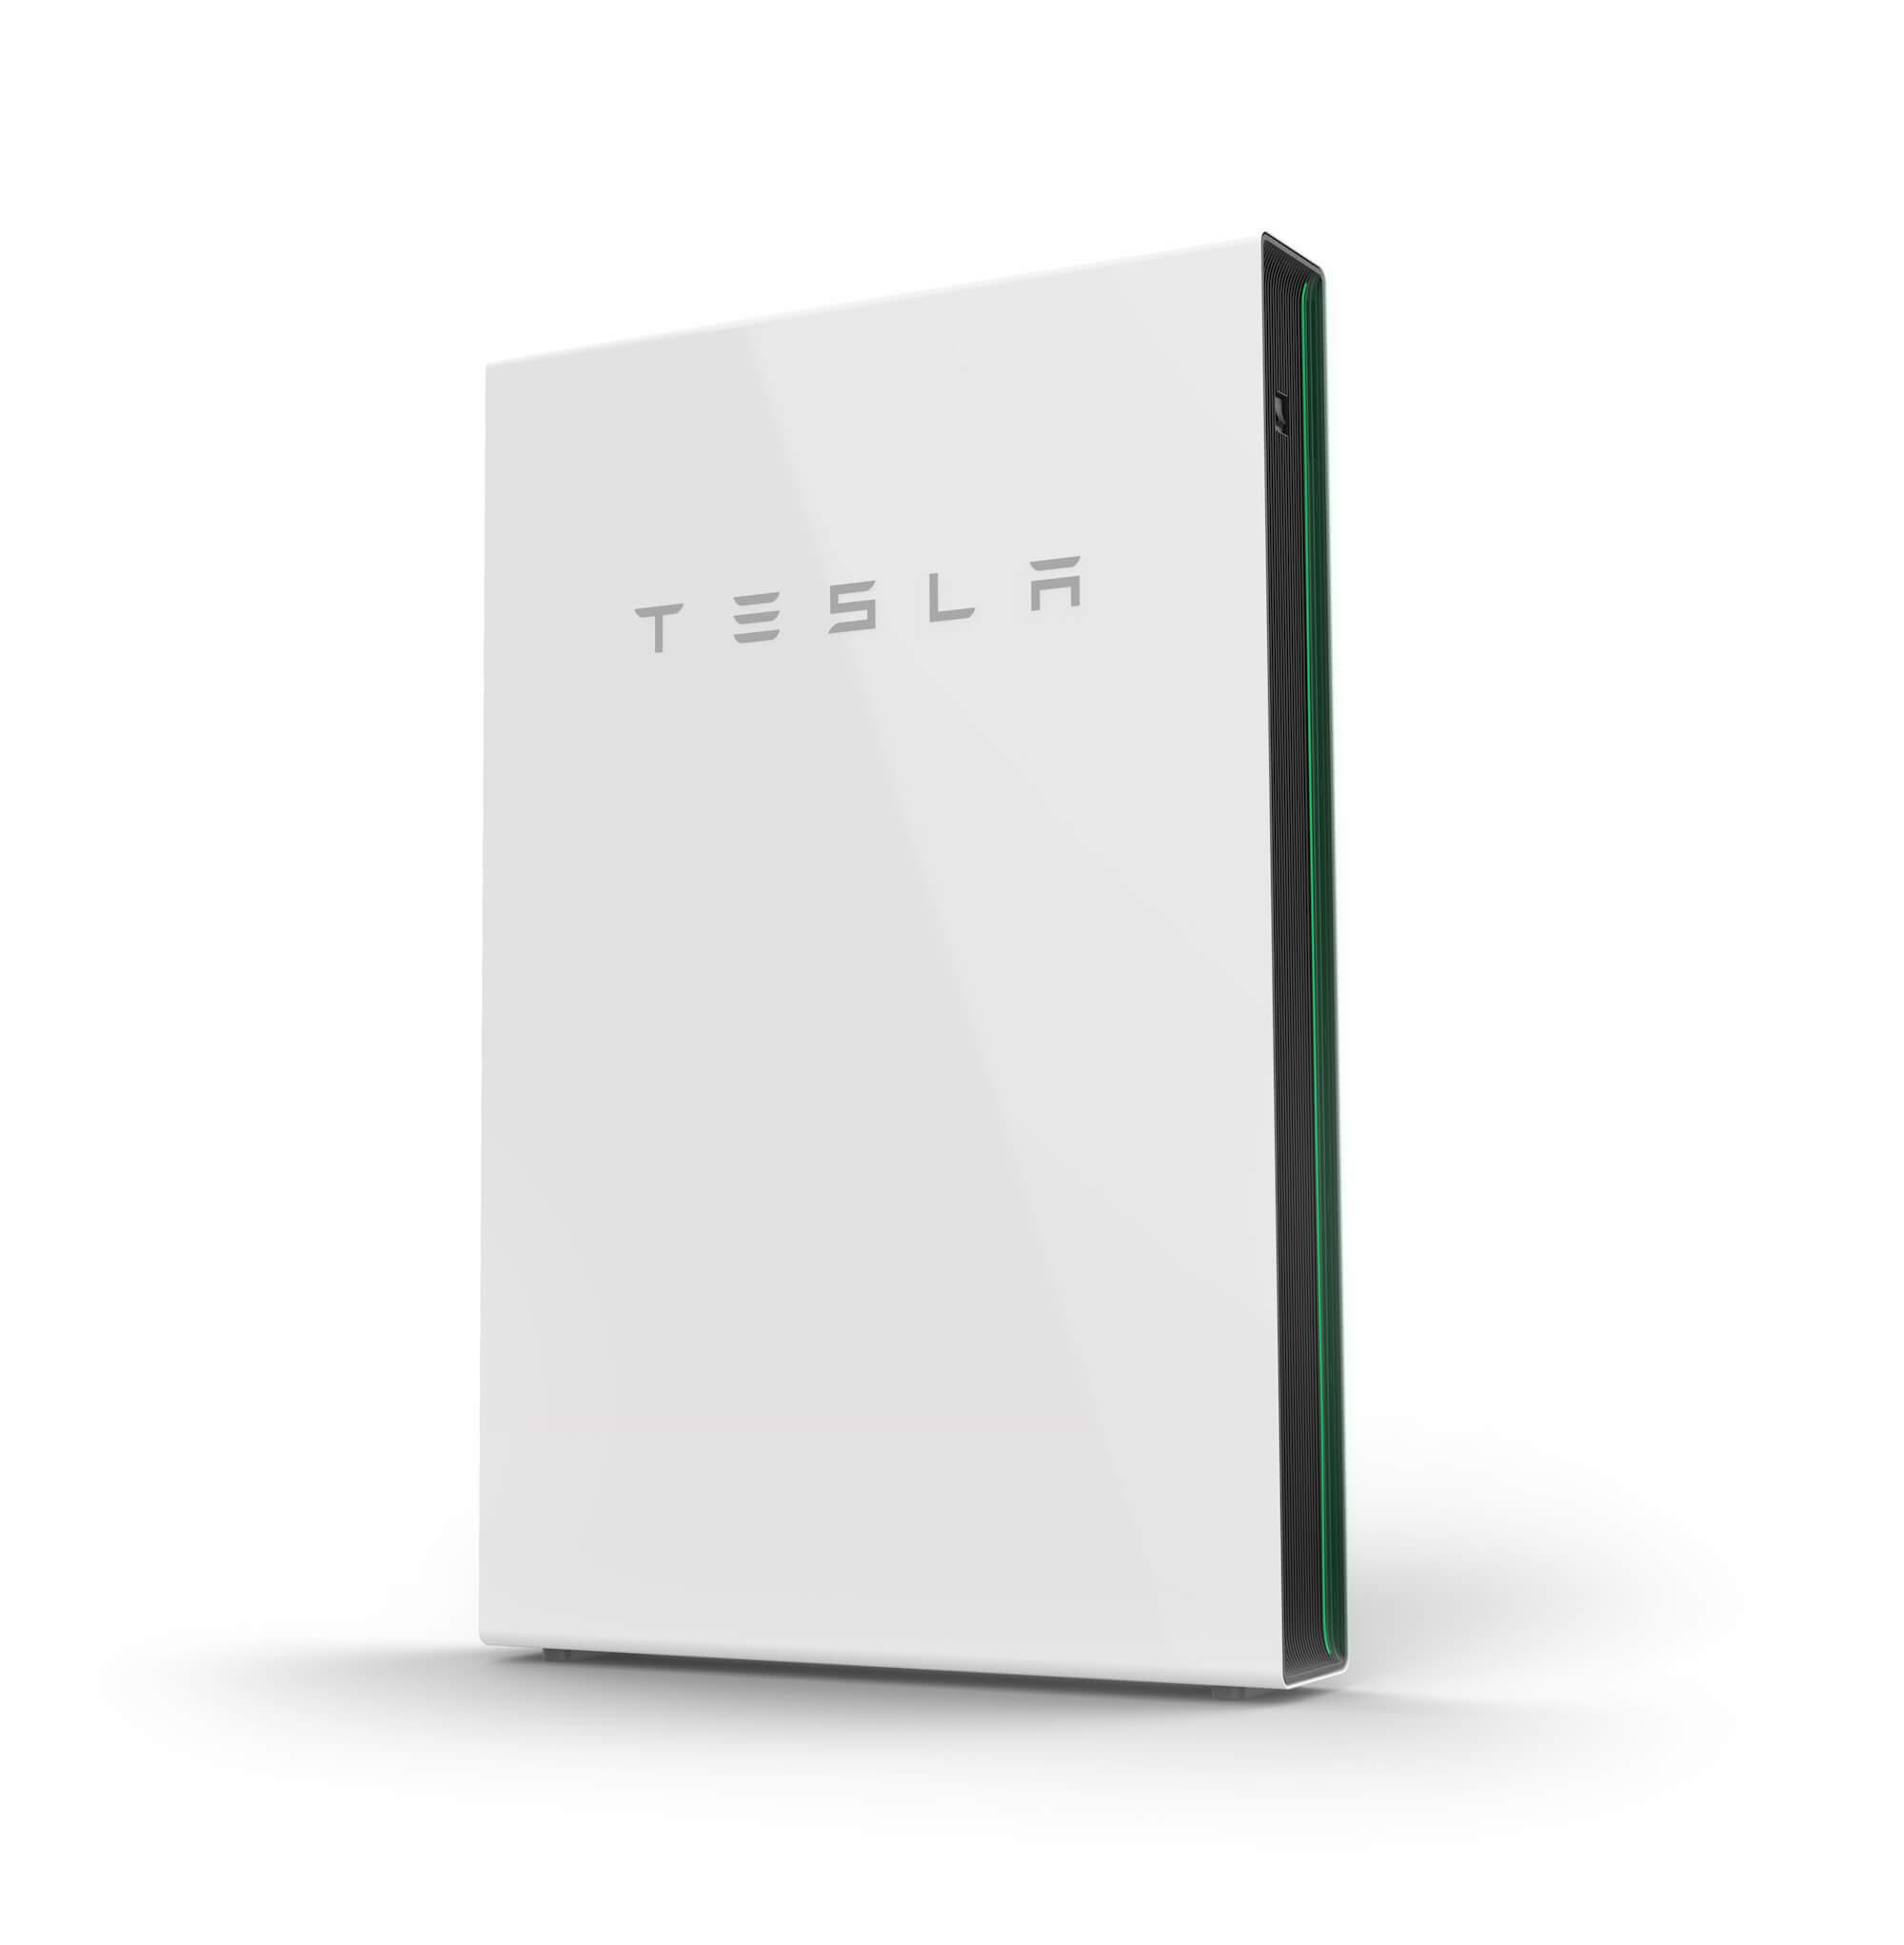 Tesla Powerwall 2 Home Battery Storage